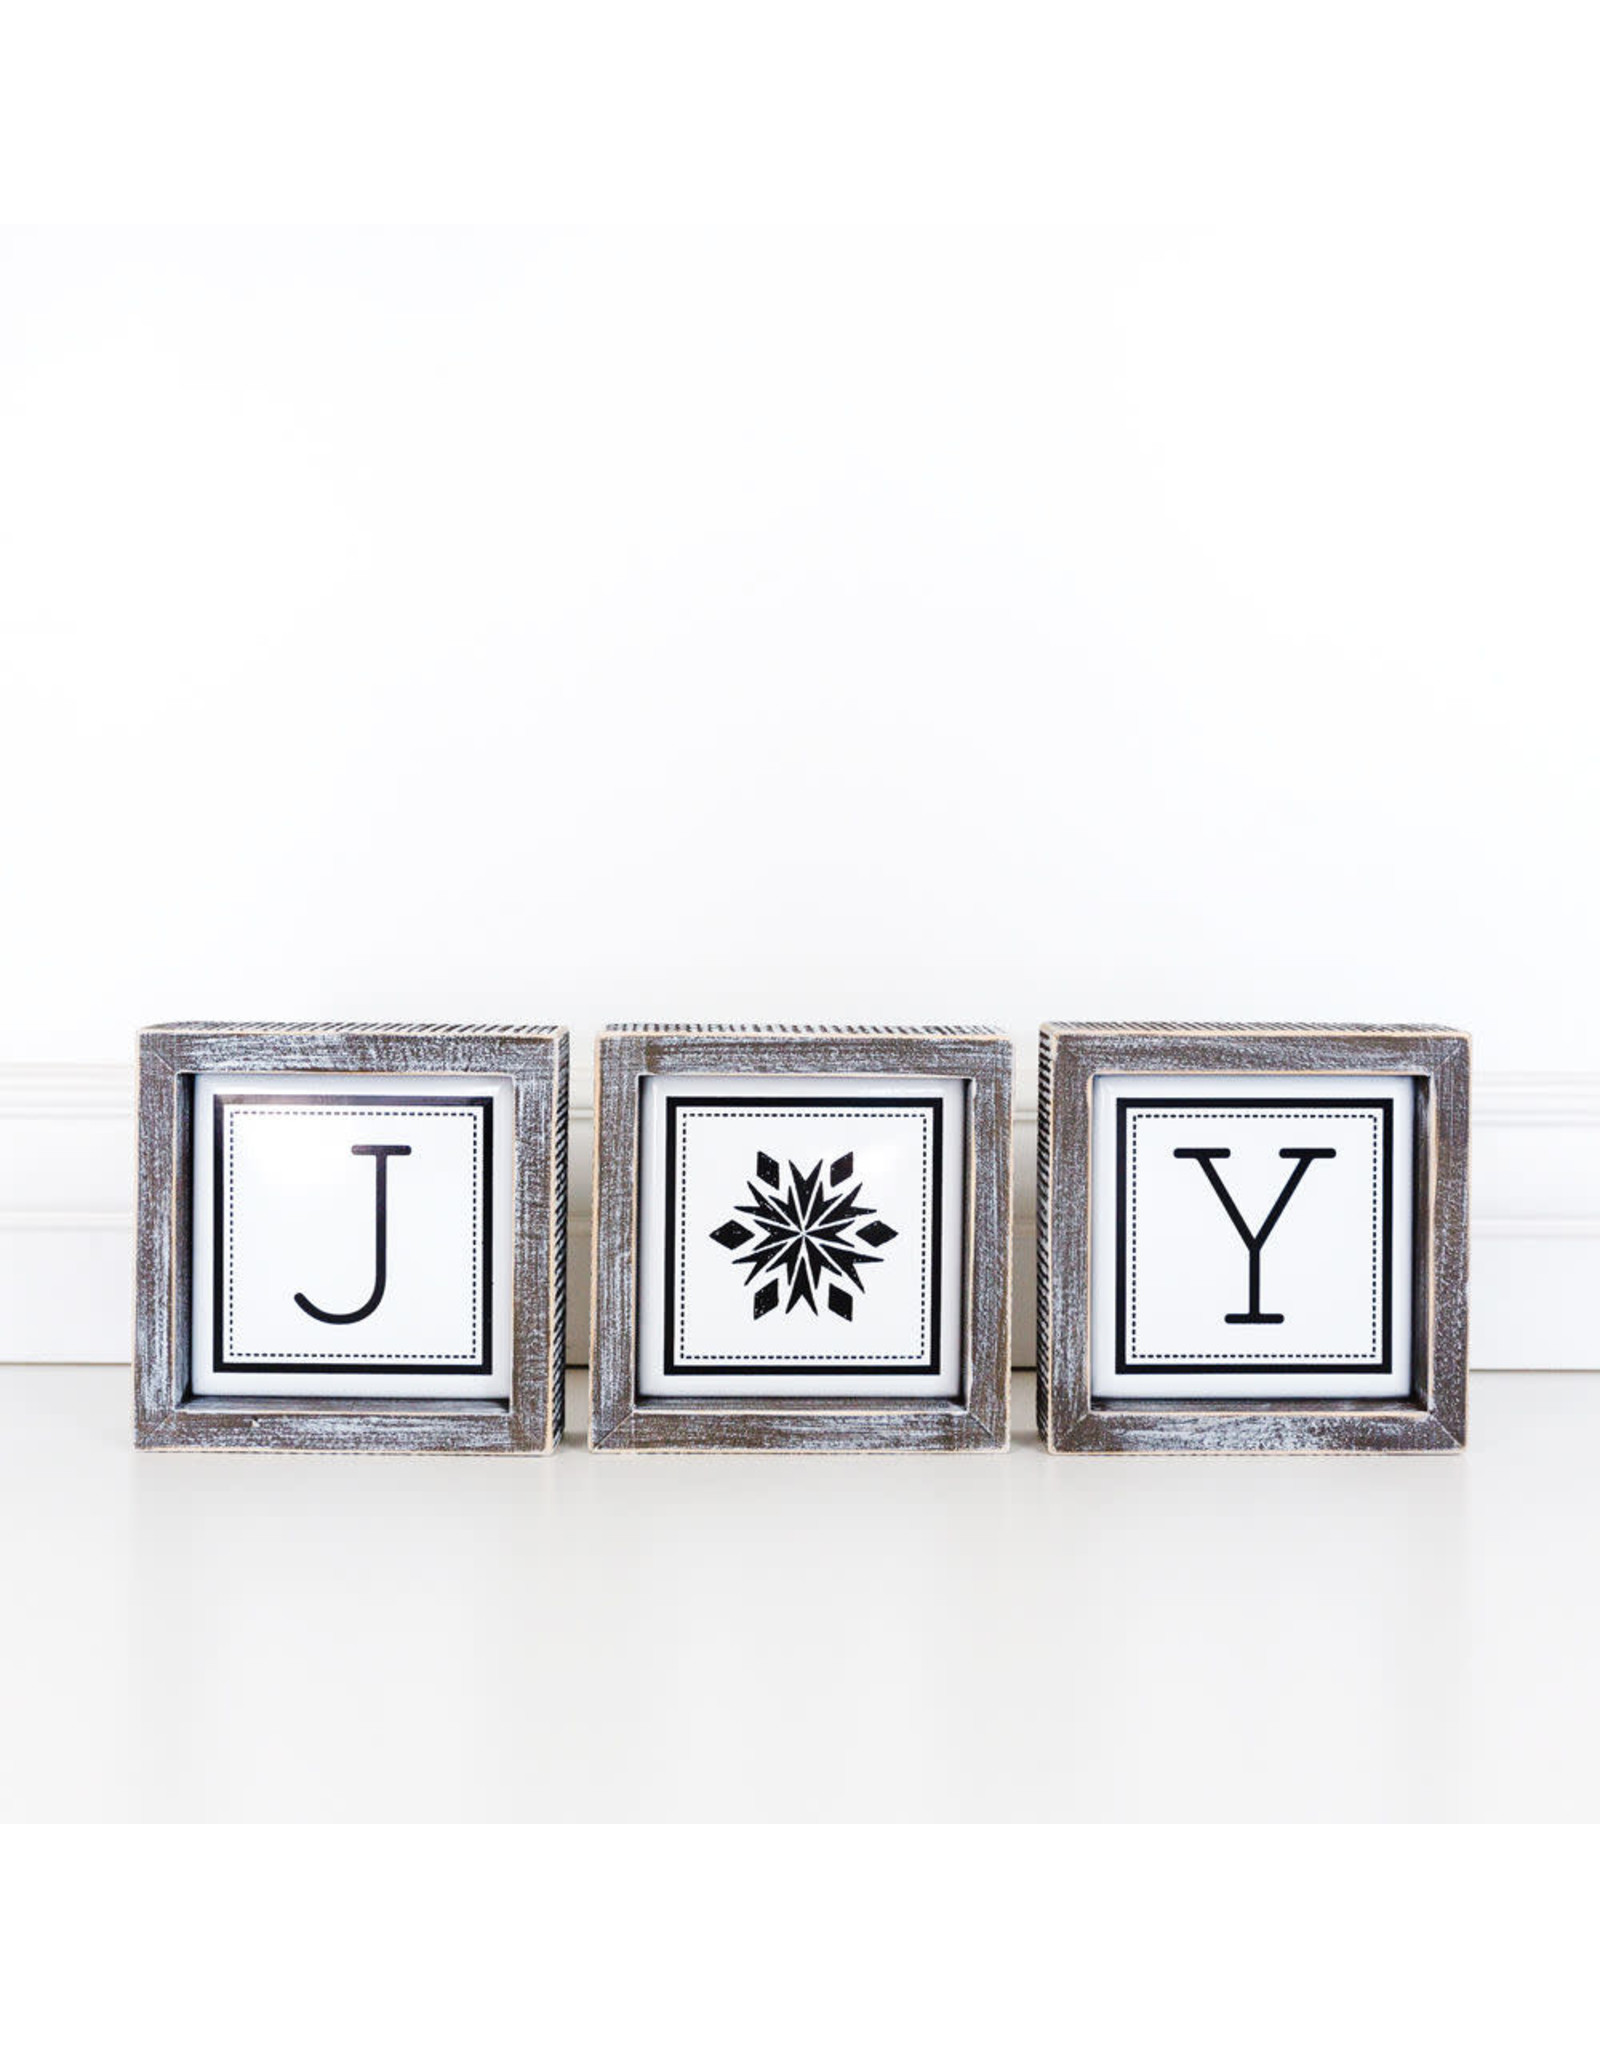 Adams & Co. JOY Wooden Framed Sign S/3